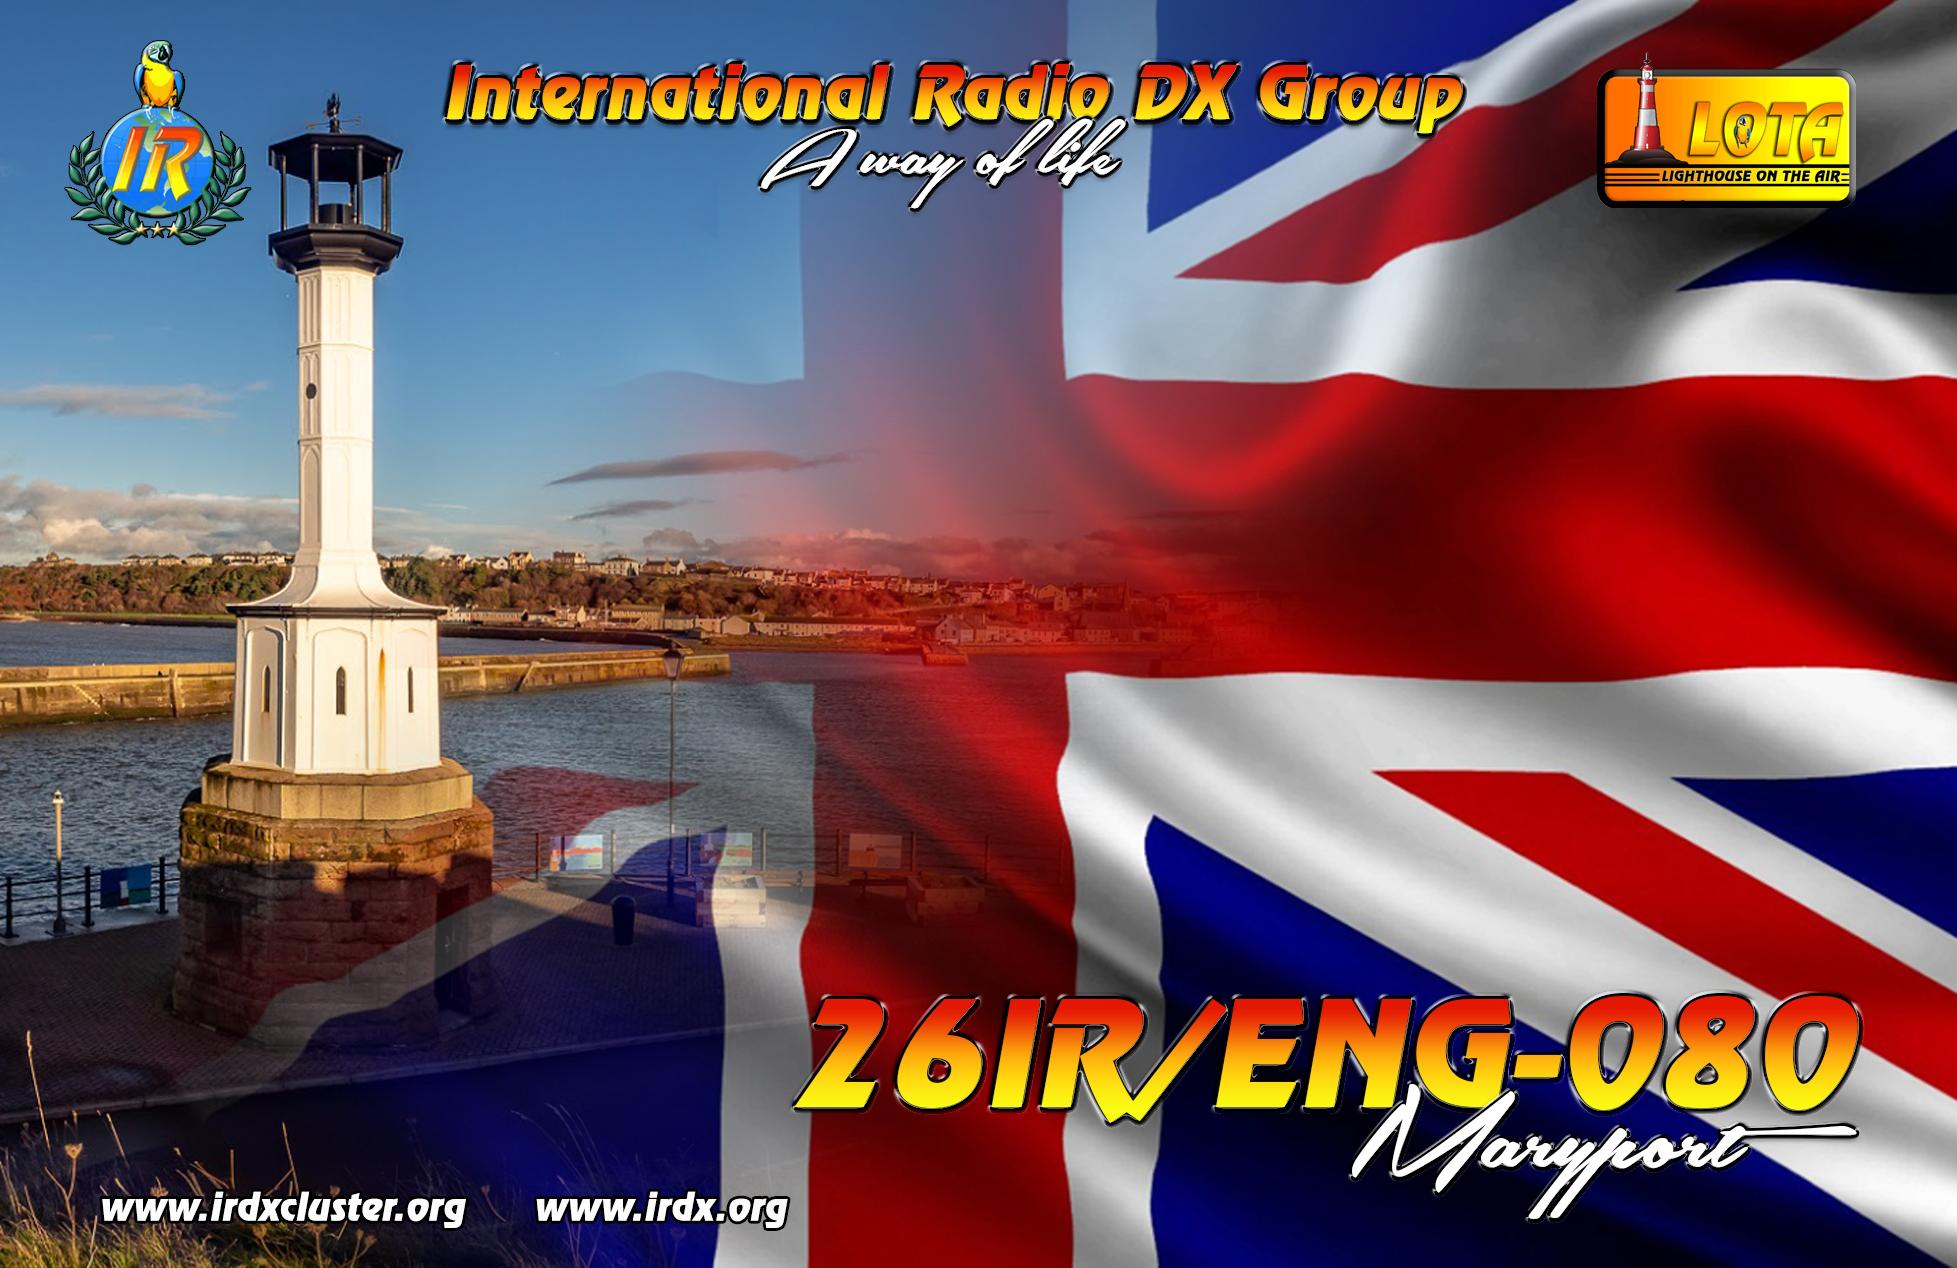 26IR/ENG280 Maryport Lighthouse (LOTA)